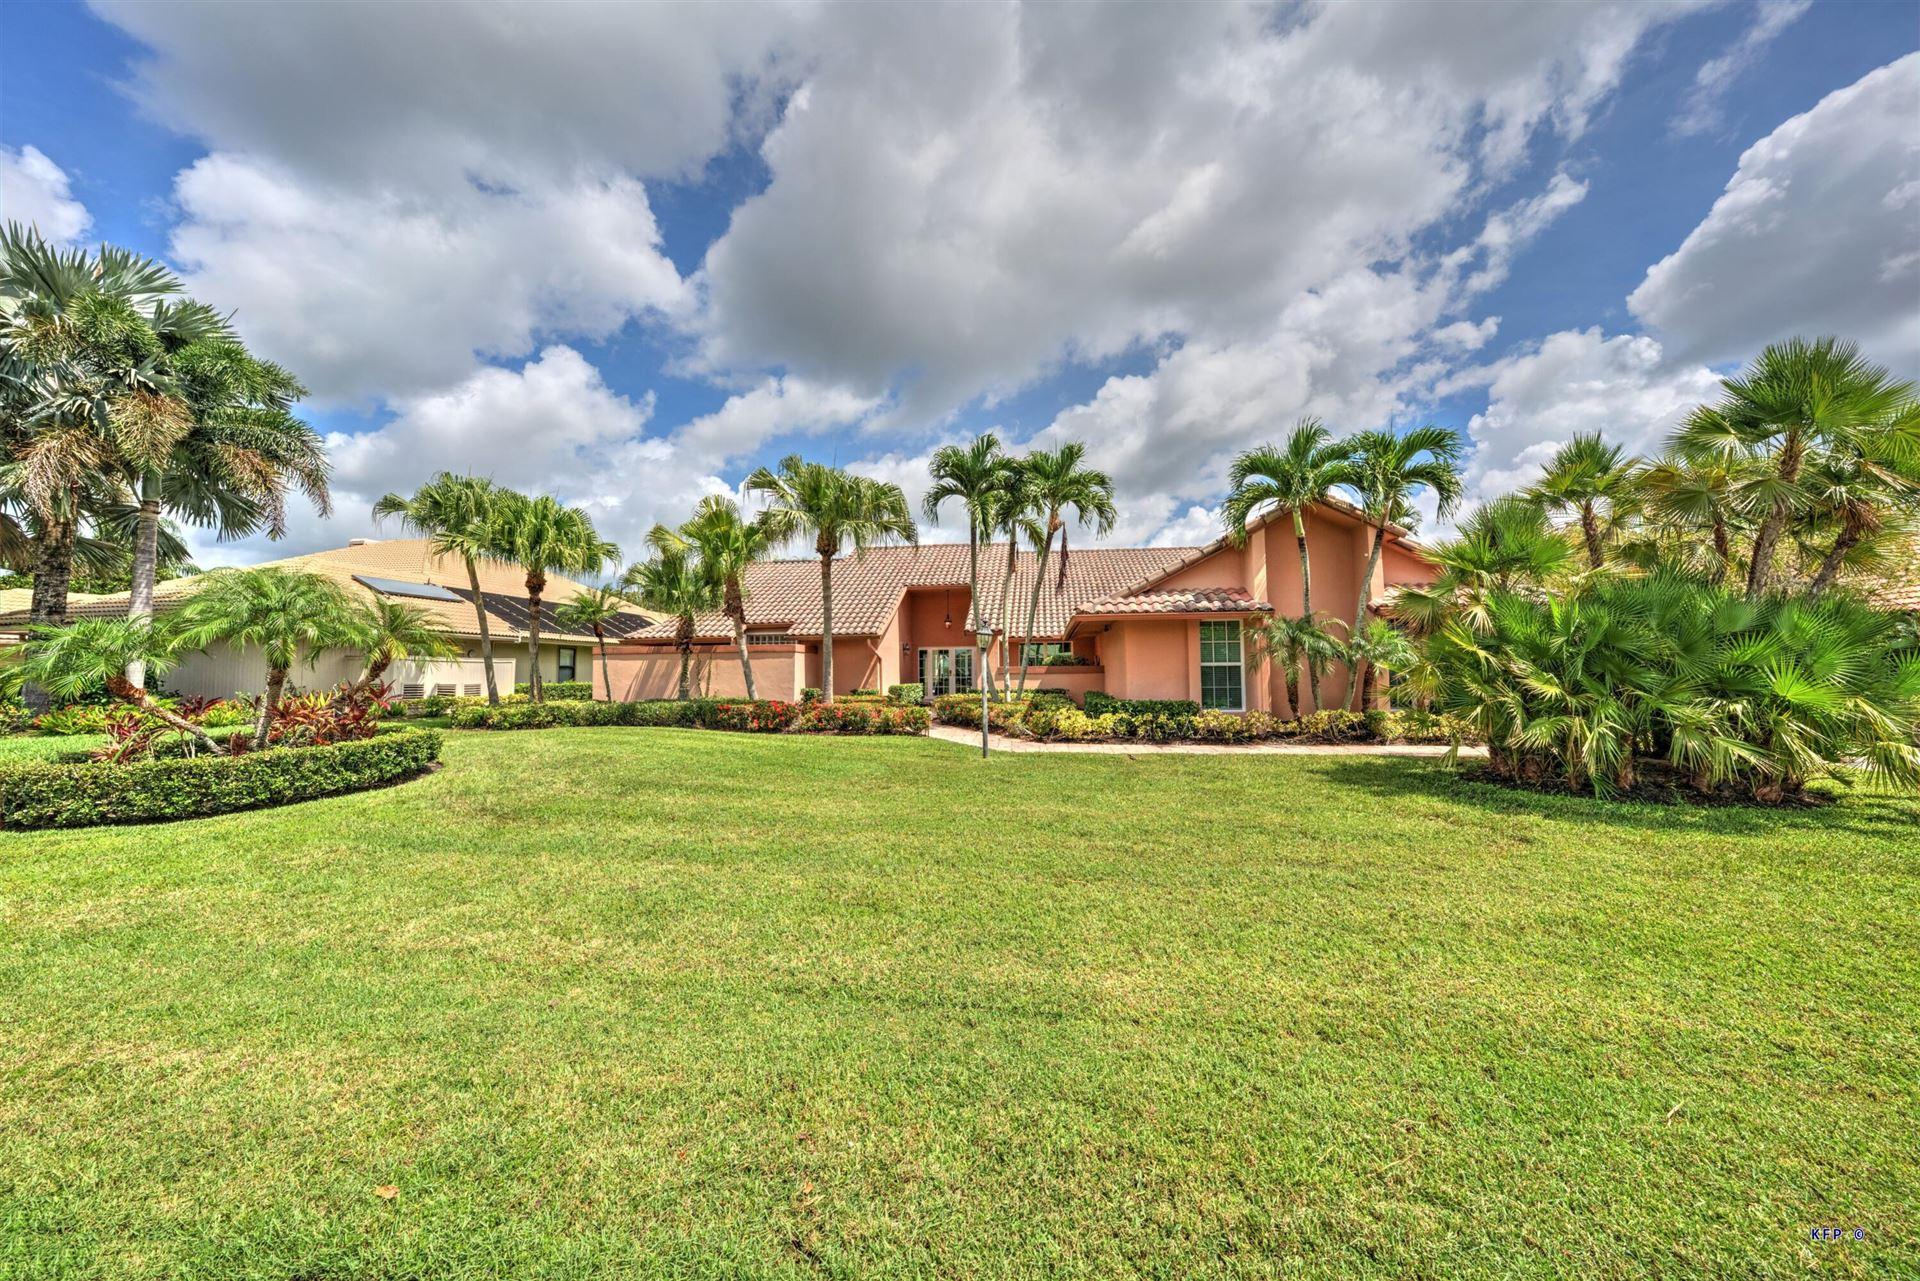 Photo of 52 Dunbar Road, Palm Beach Gardens, FL 33418 (MLS # RX-10746880)